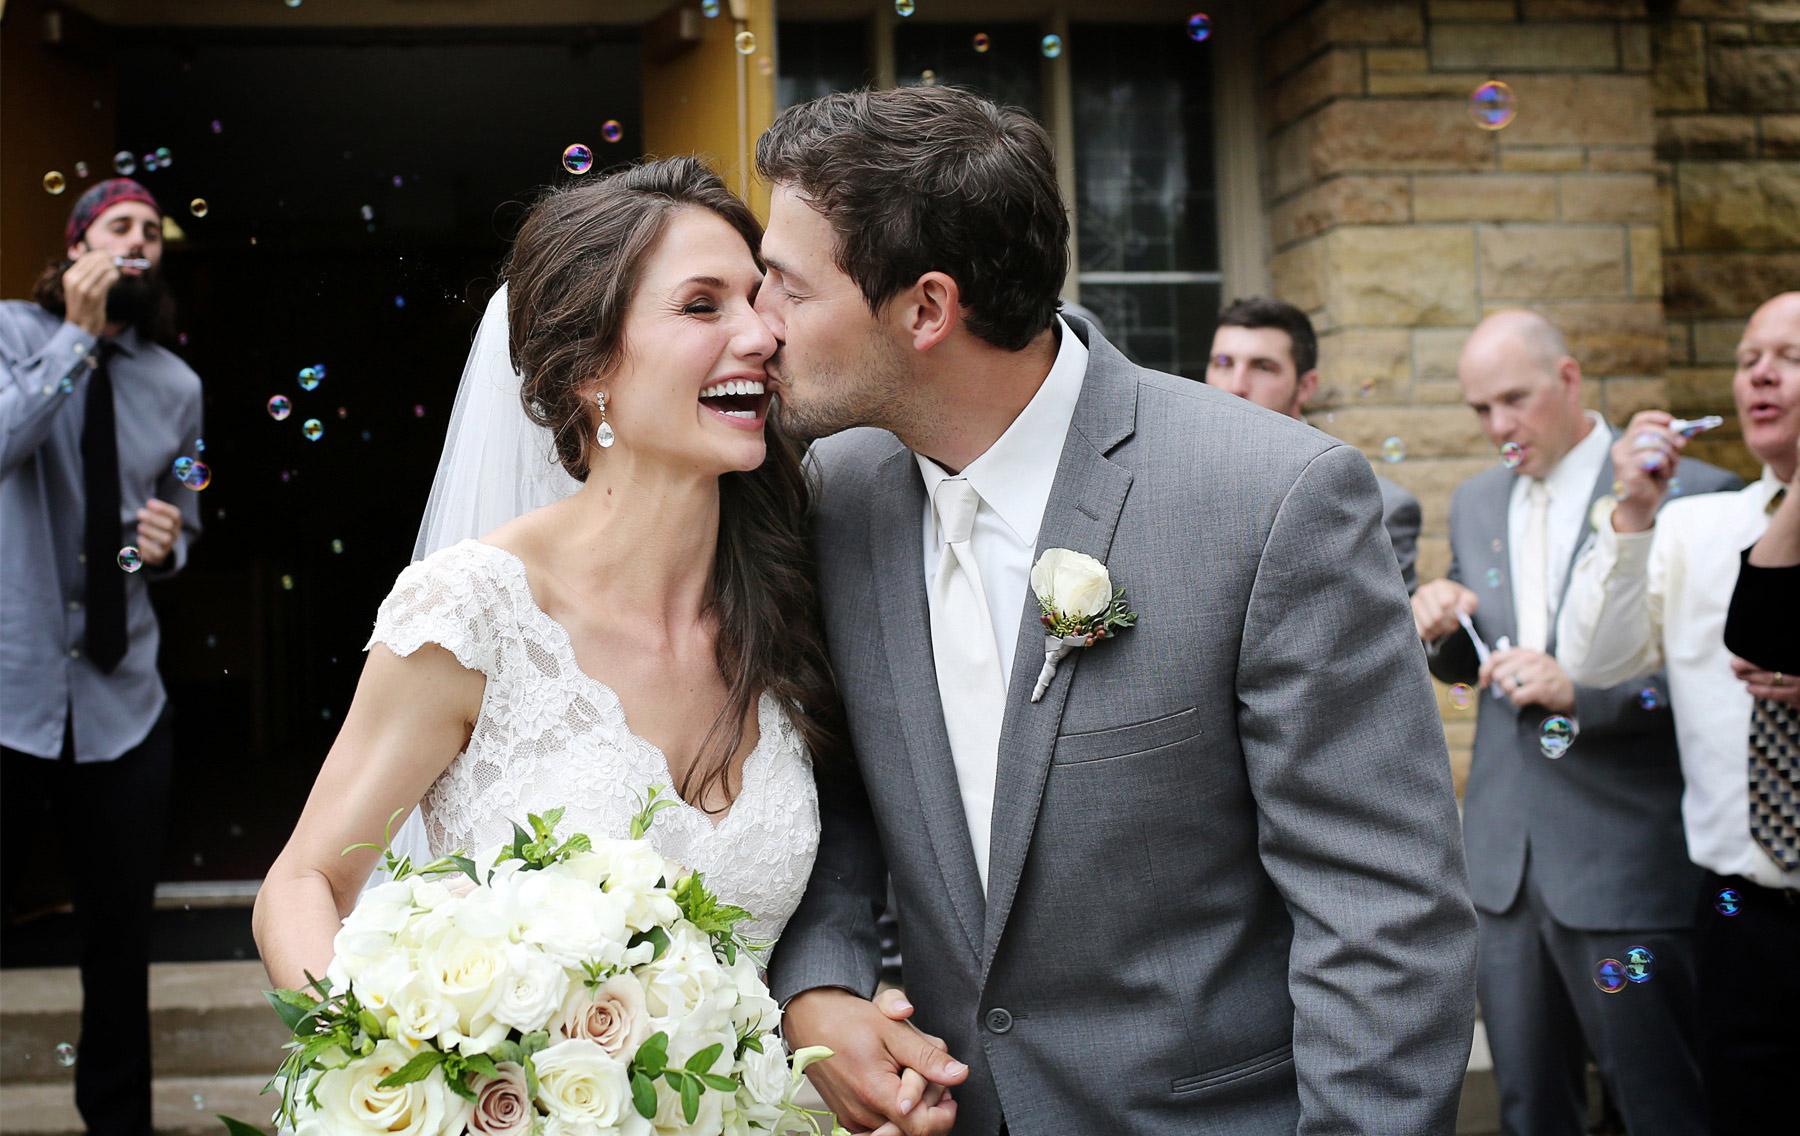 09-Stillwater-Minnesota-Wedding-Photography-by-Vick-Photography--St-Patricks-Church-Ceremony-Bubbles-Alicia-&-Cole.jpg